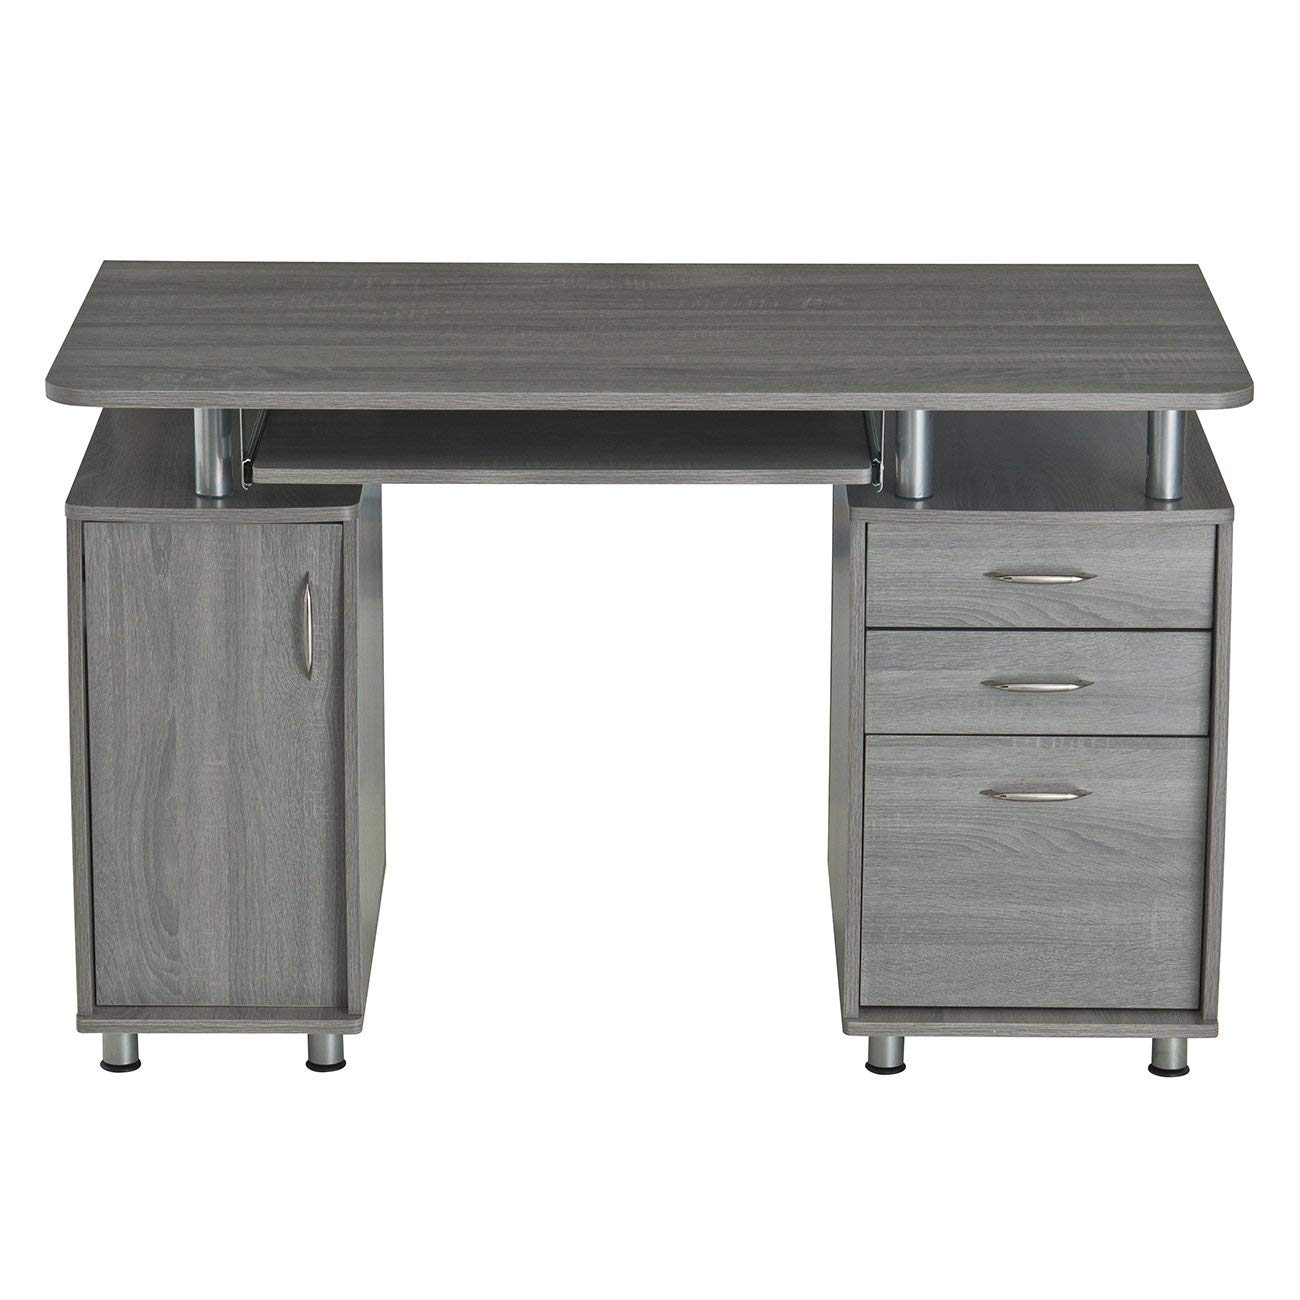 MyEasyShopping Modern Designs Grey MDF Multifunctional Office Desk With File Cabinet Keys Office Cabinet Desk File Furniture 2